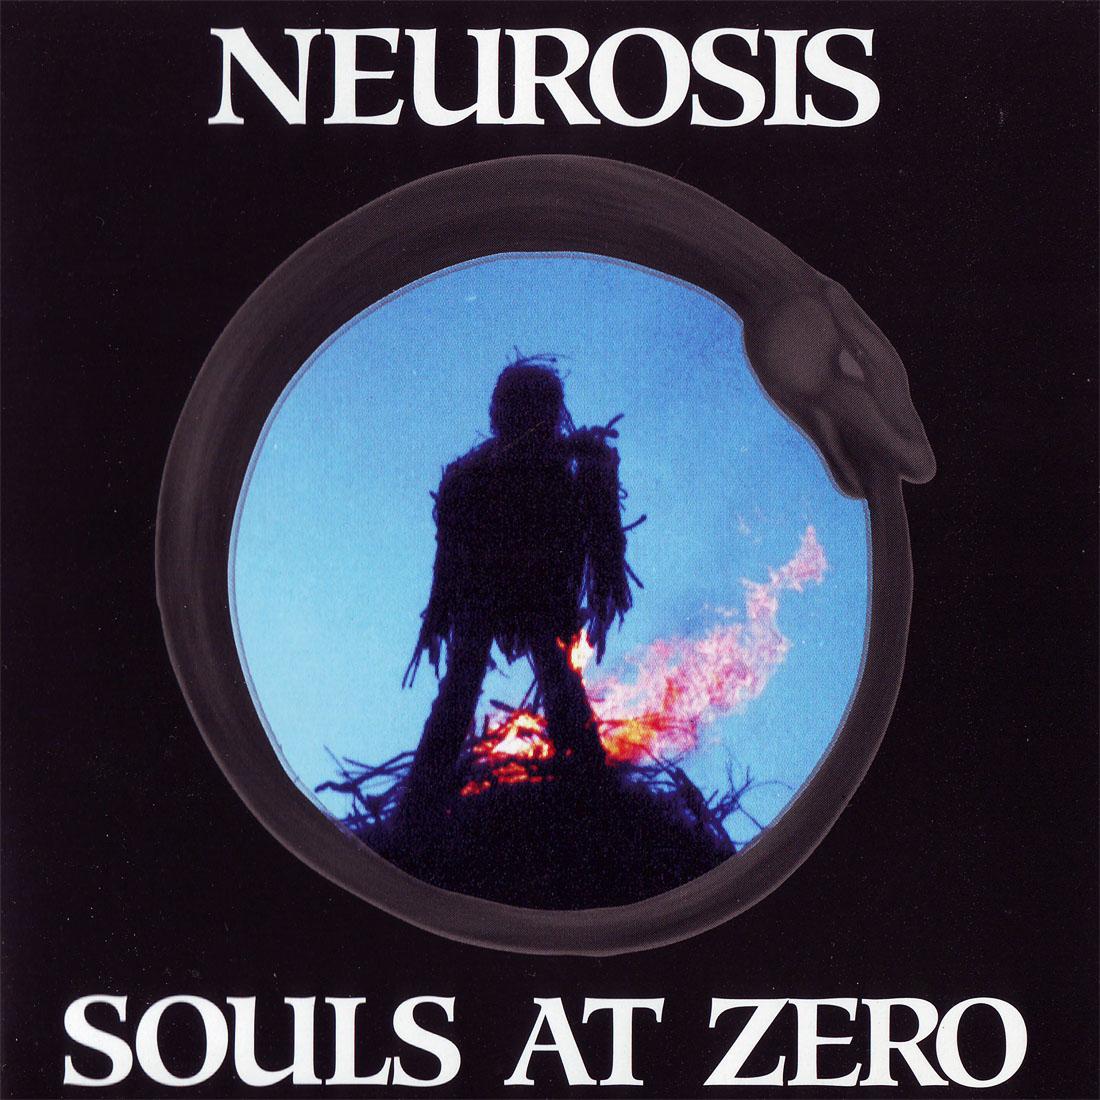 NEUROSIS - Souls at Zero cover